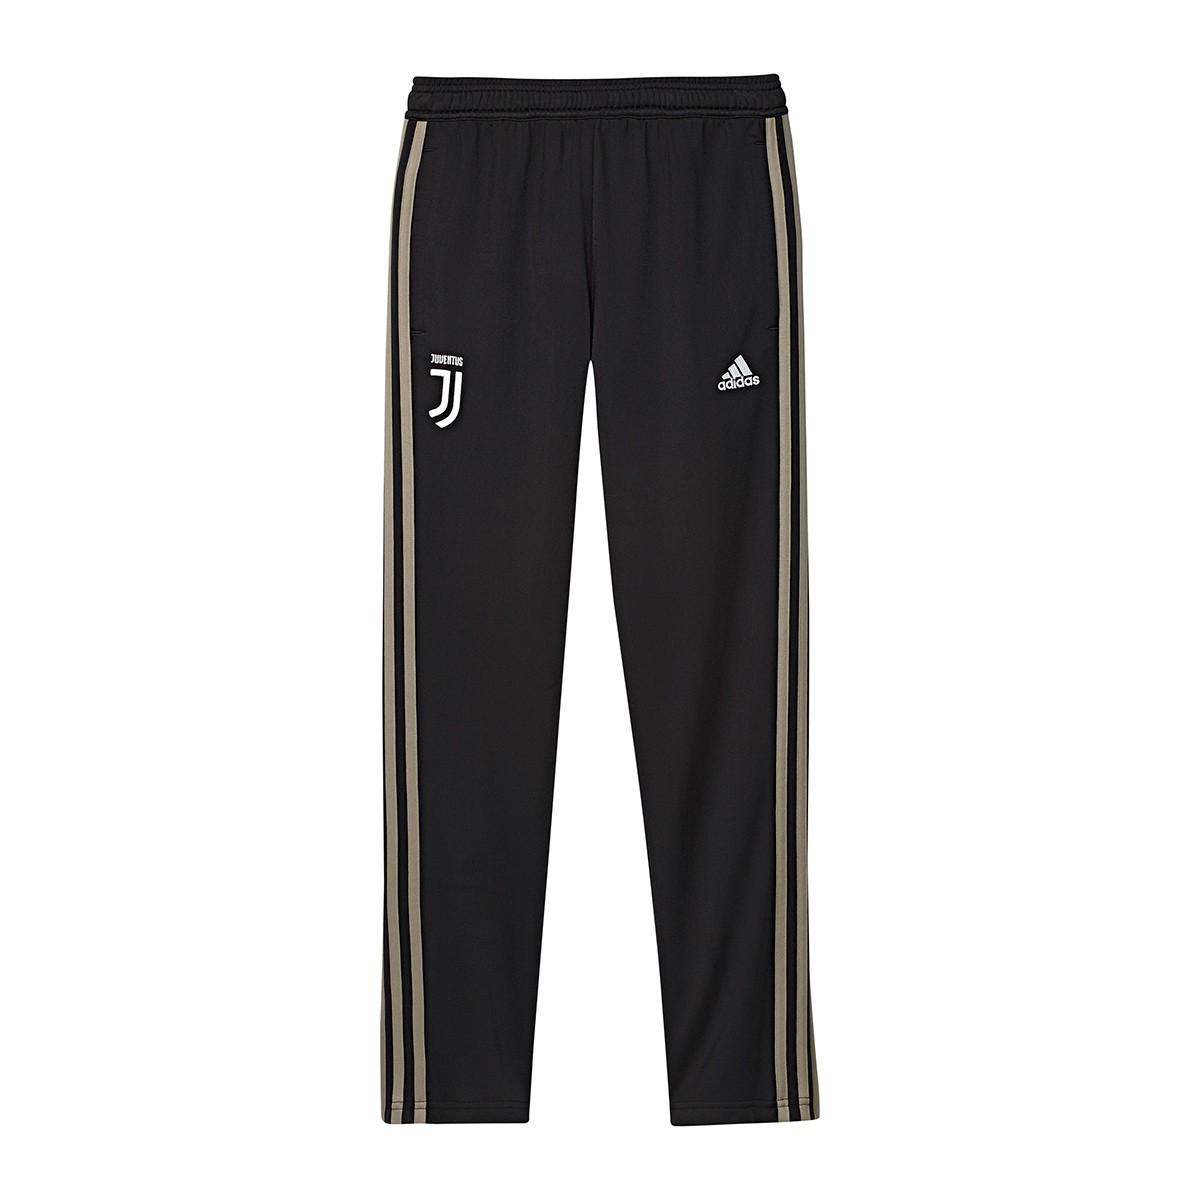 18516c157 Long pants adidas Kids Juventus PES 2018-2019 Black-Clay - Tienda de ...